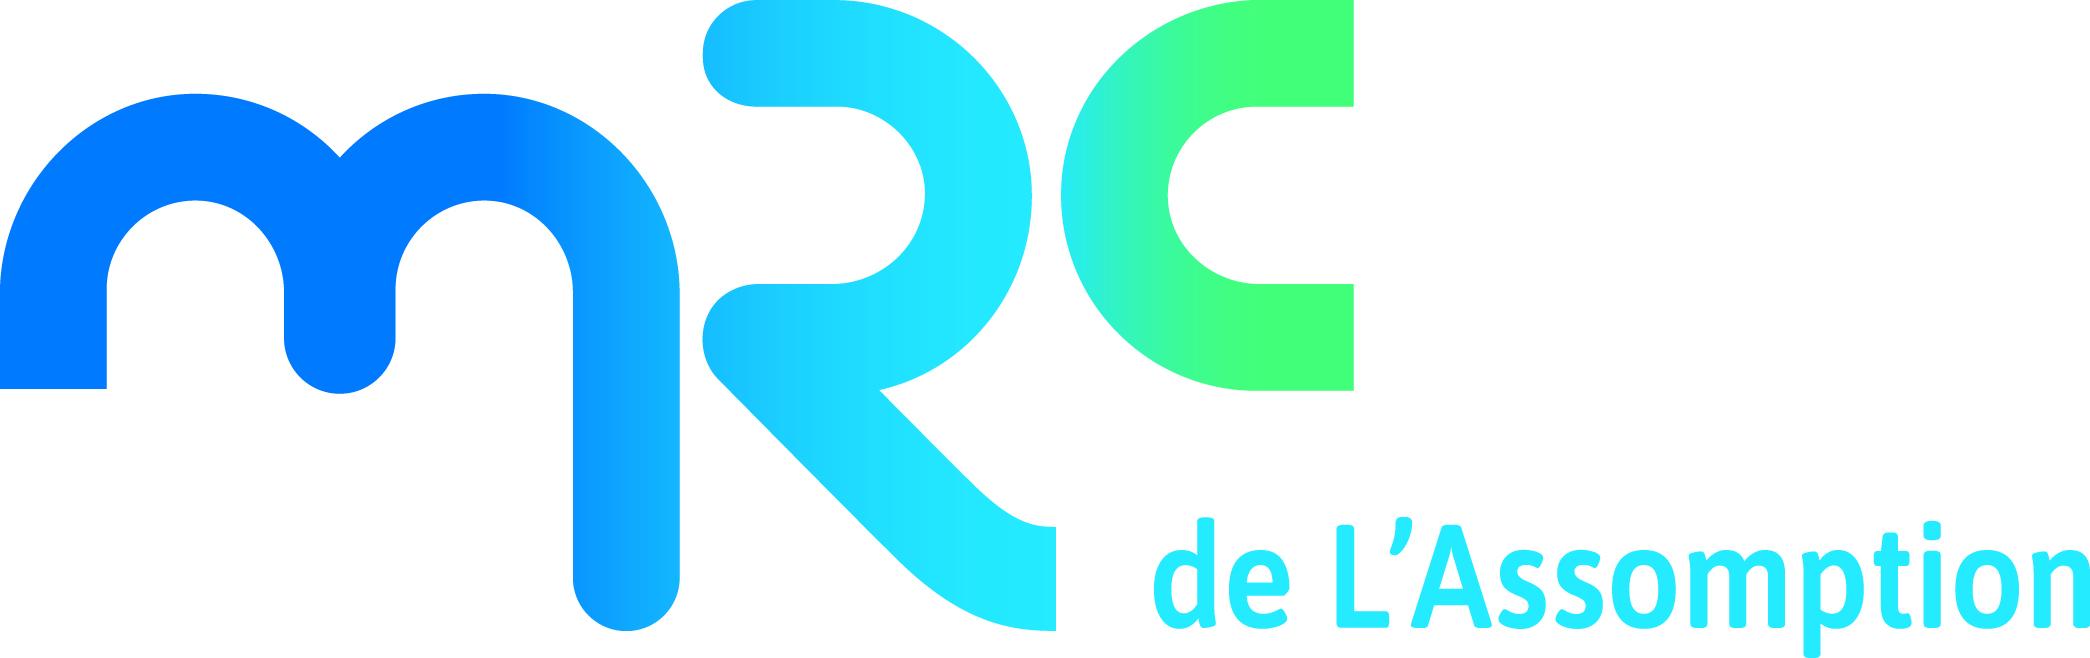 Logos-MRC-CMYK (1).jpg